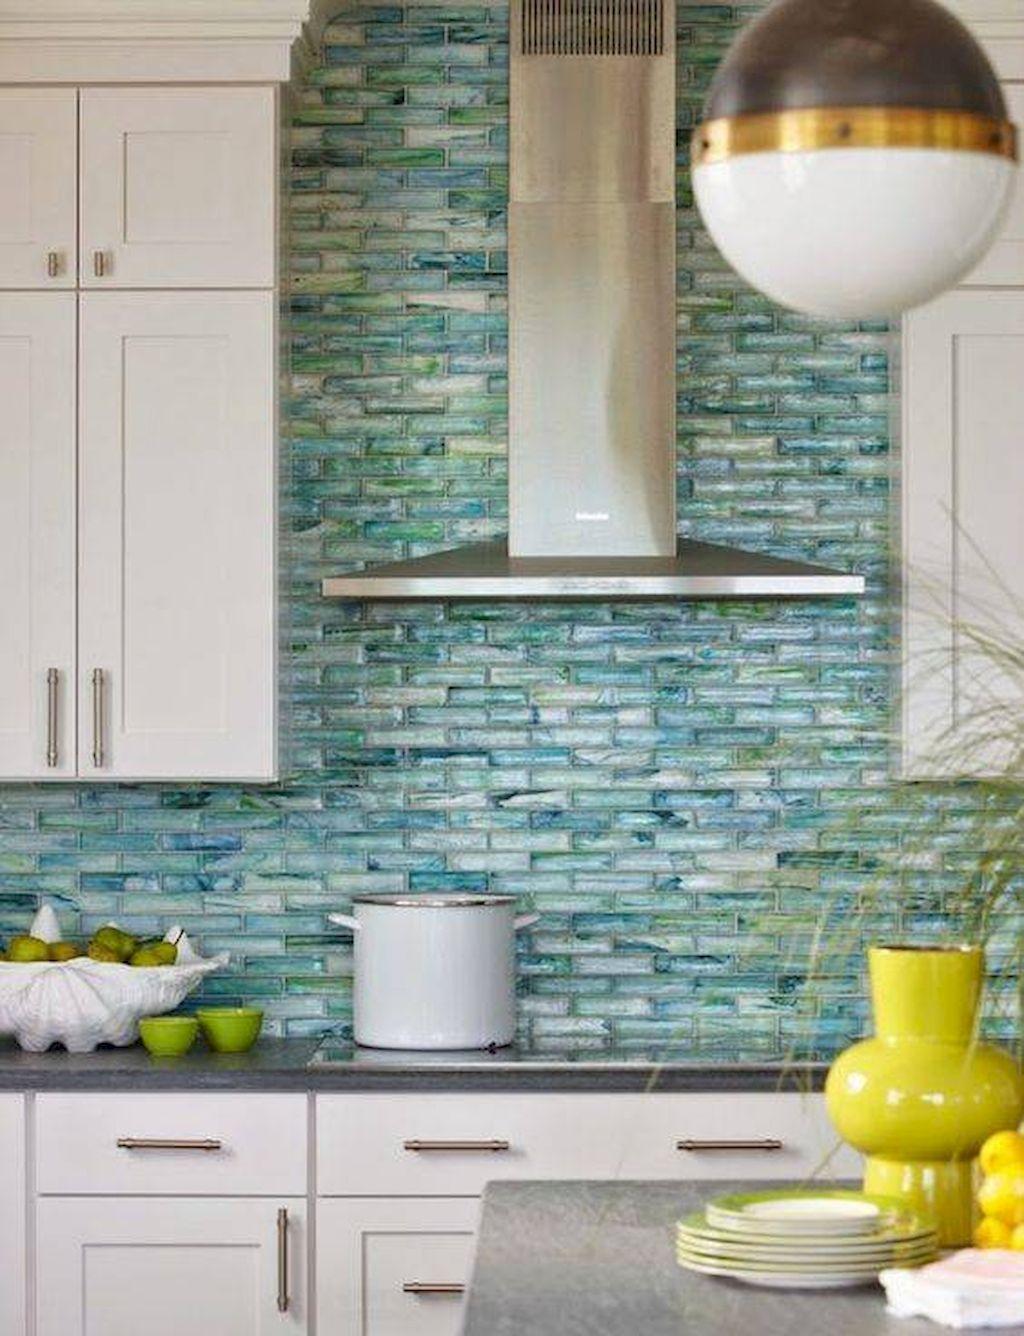 60 Beautiful Kitchen Backsplash Tile Patterns Ideas | Kitchen ...